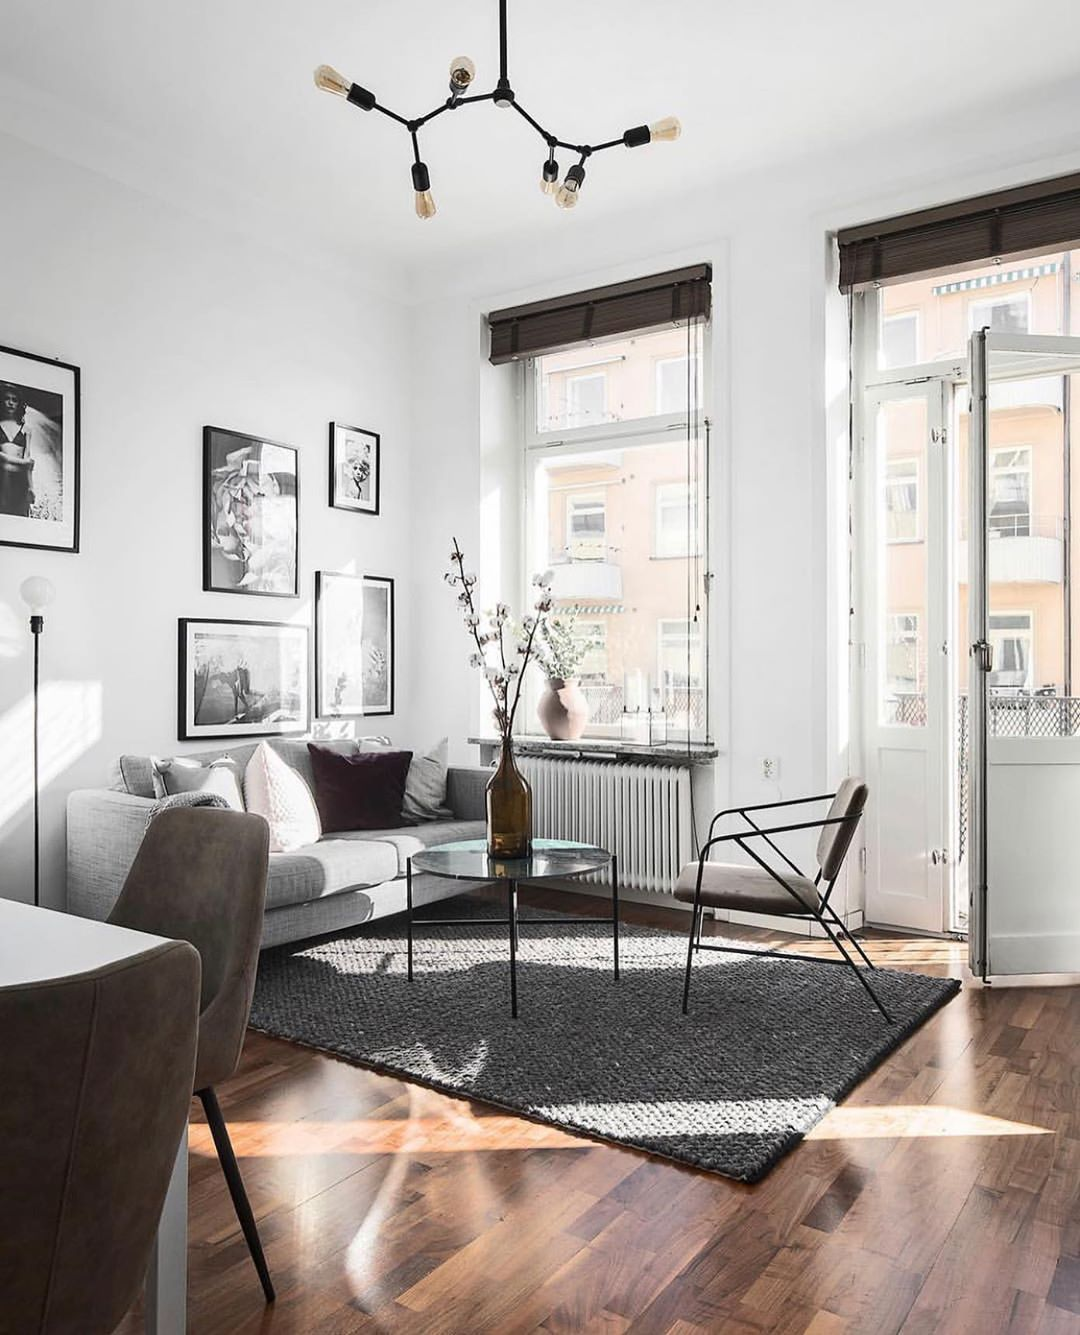 Scandinavian Homes On Instagram Styling Scandinavianhomes Photo Kronfoto Minimalist Living Room Design Minimalist Living Room Scandinavian Interior Design